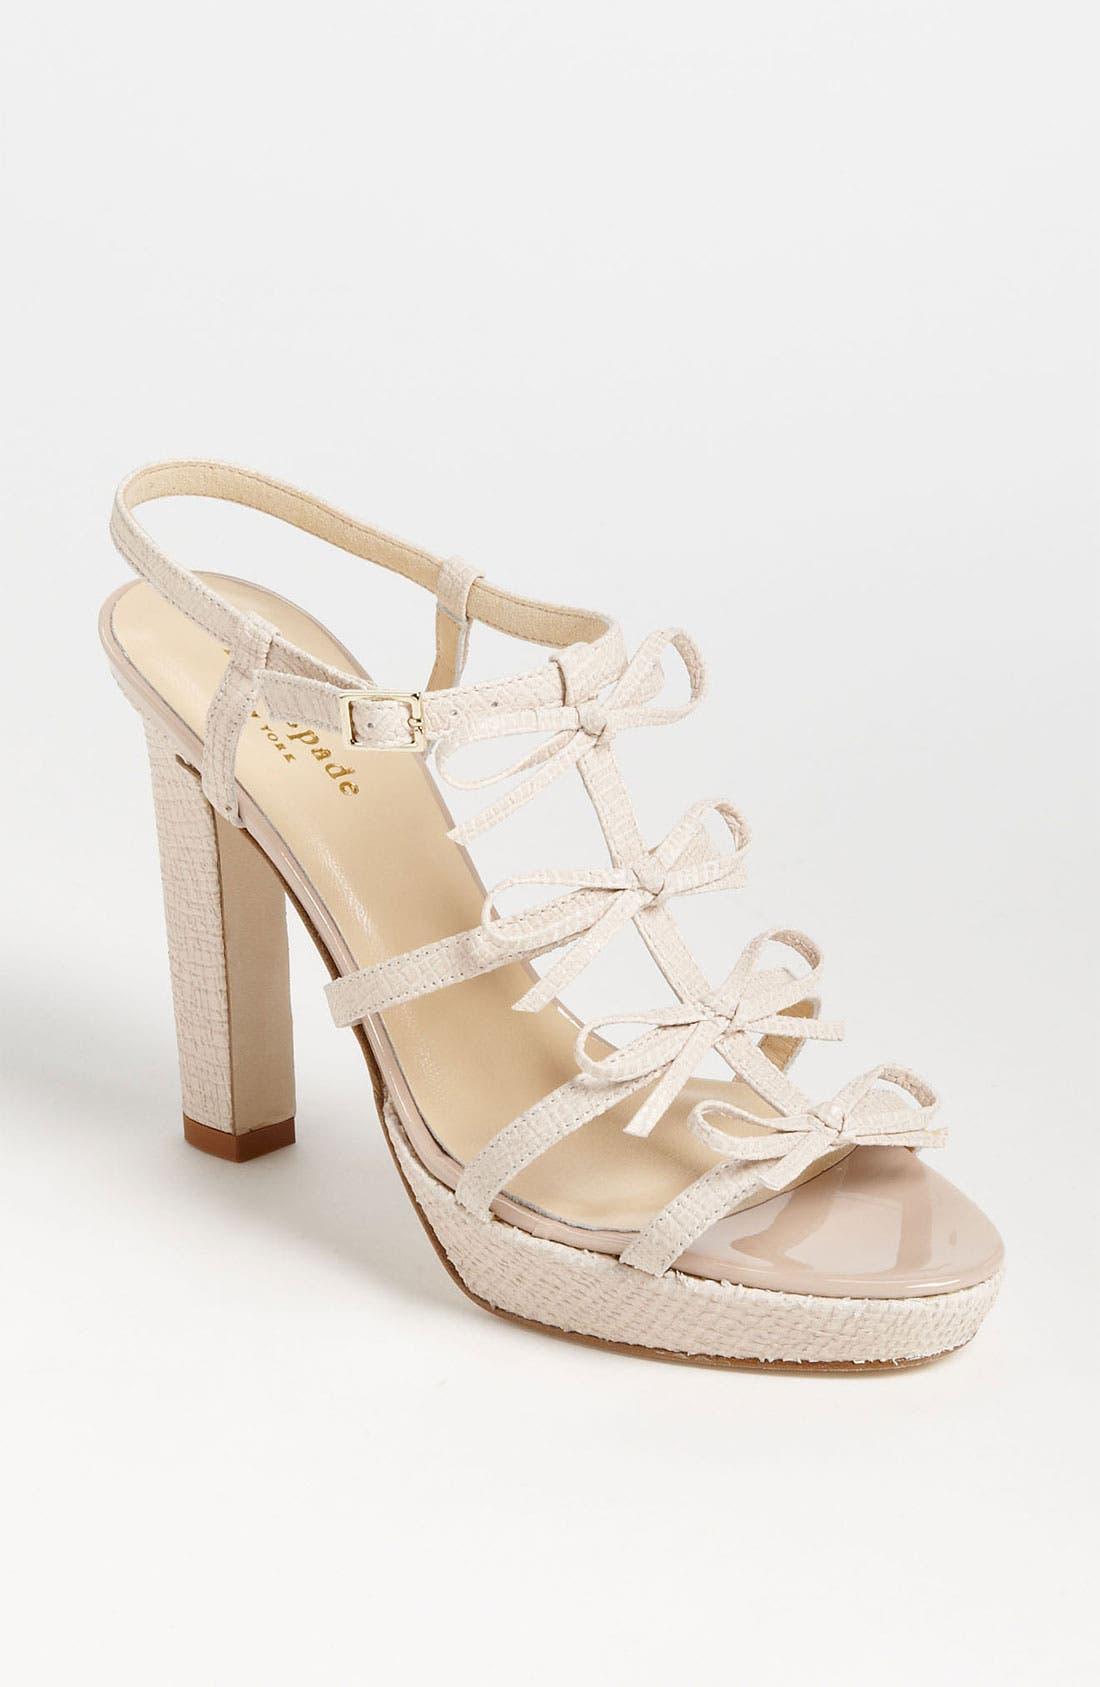 Alternate Image 1 Selected - kate spade new york 'baylyn' sandal